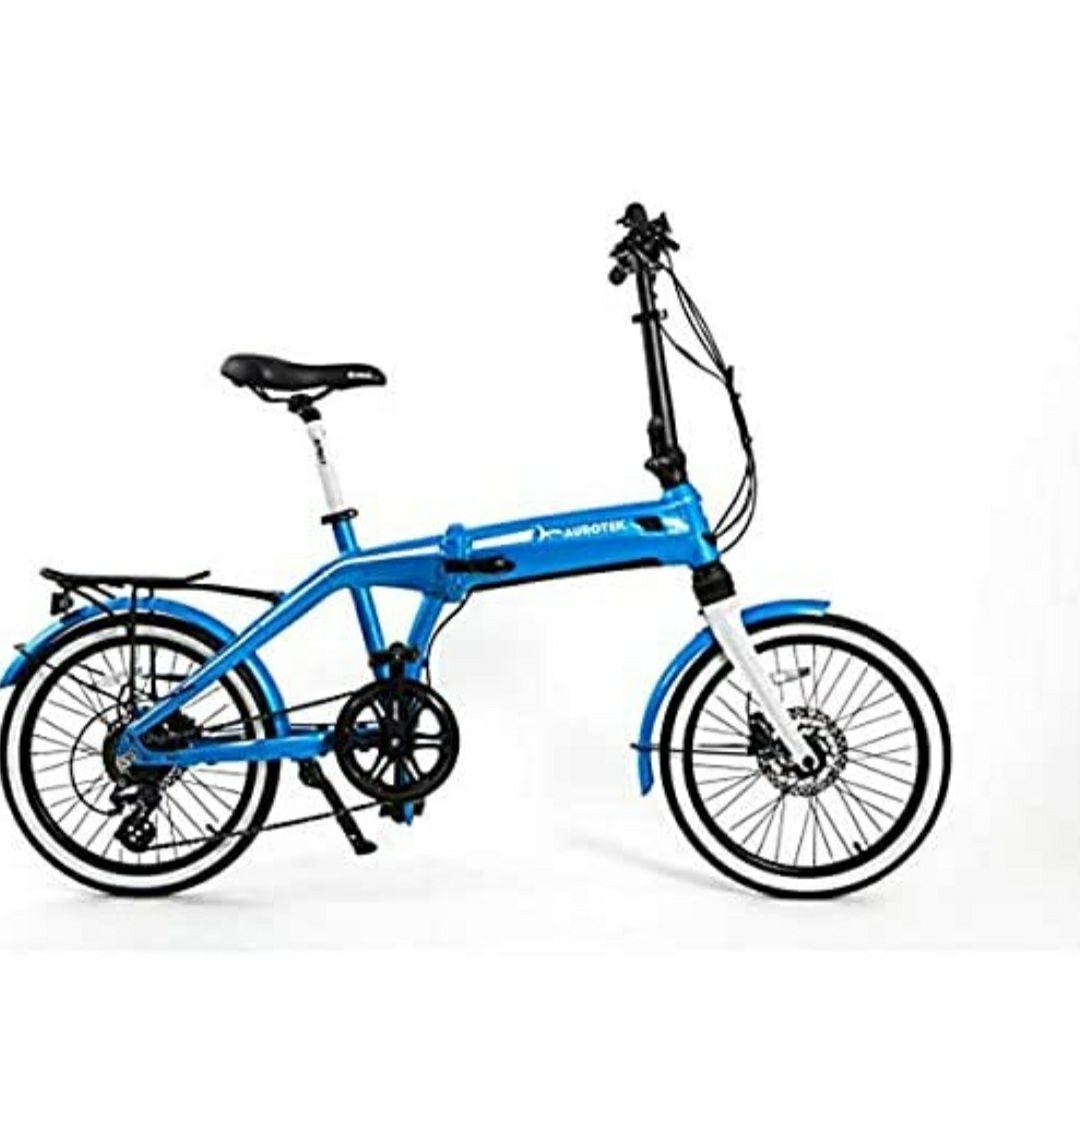 "Aurotek Sintra Bicicleta Eléctrica Plegable de 20"", Adultos Unisex, Ocean Blue, Mediano"